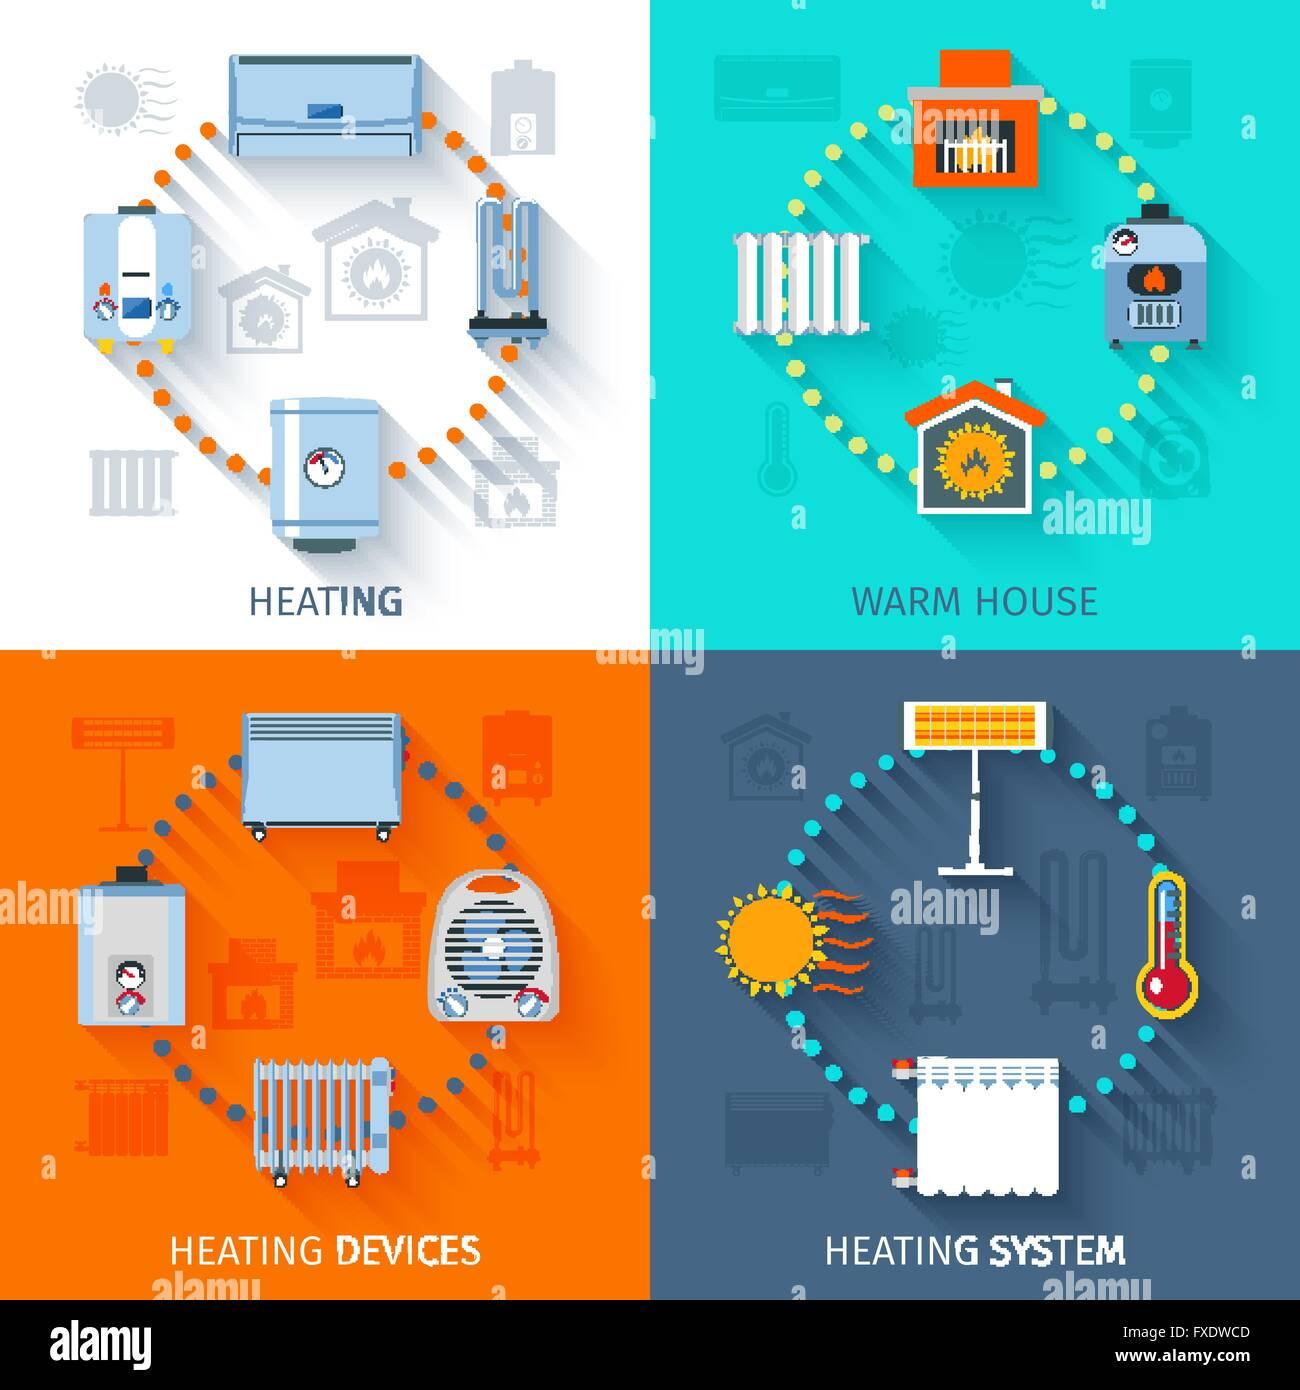 Heating System Icon Set Stock Vector Art & Illustration, Vector ...